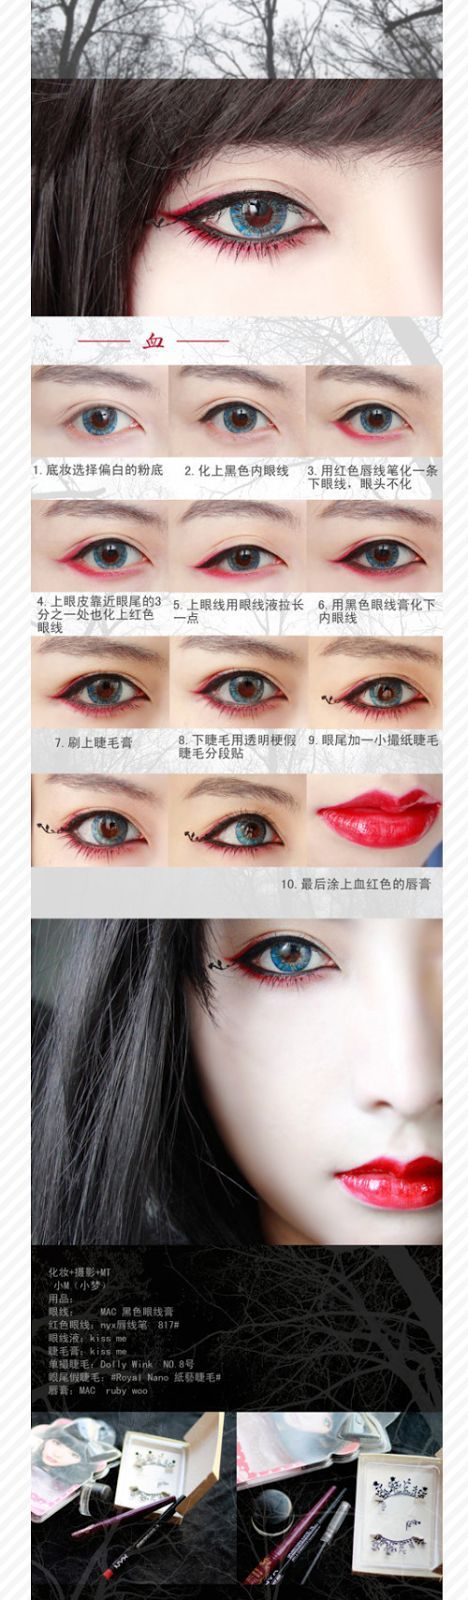 DIY Ideas Makeup : GOTHIC & Seductively SEXY VAMPIRE WOMEN EYE MaKeUp DIY Beauty TUTORIAL